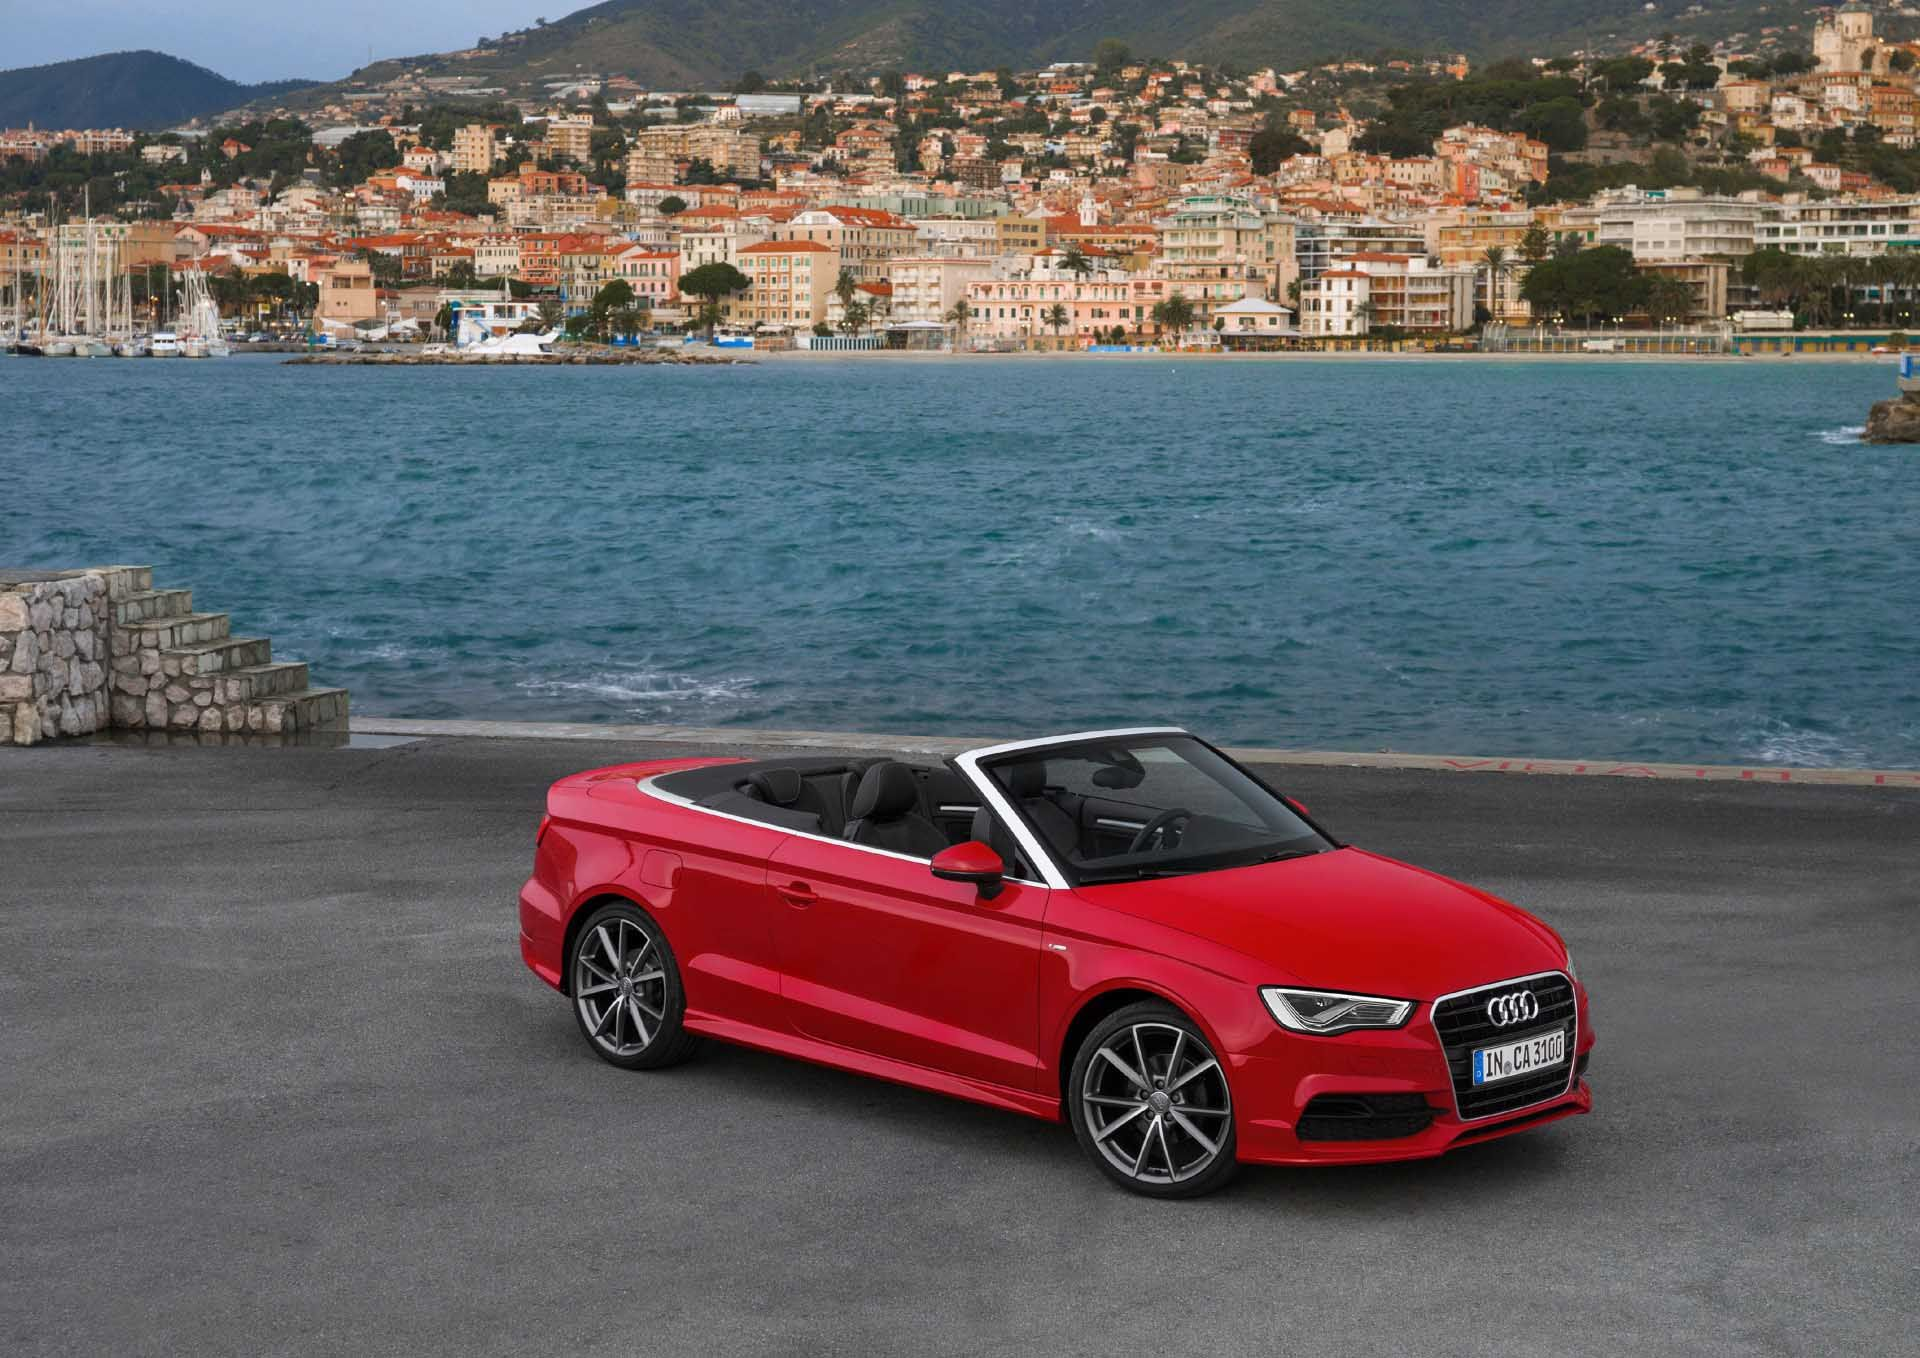 Download Fabulous Audi A3 Cabriolet Lease High Definition Full Size 60 A3 Cabriolet Audi A3 Cabriolet Audi